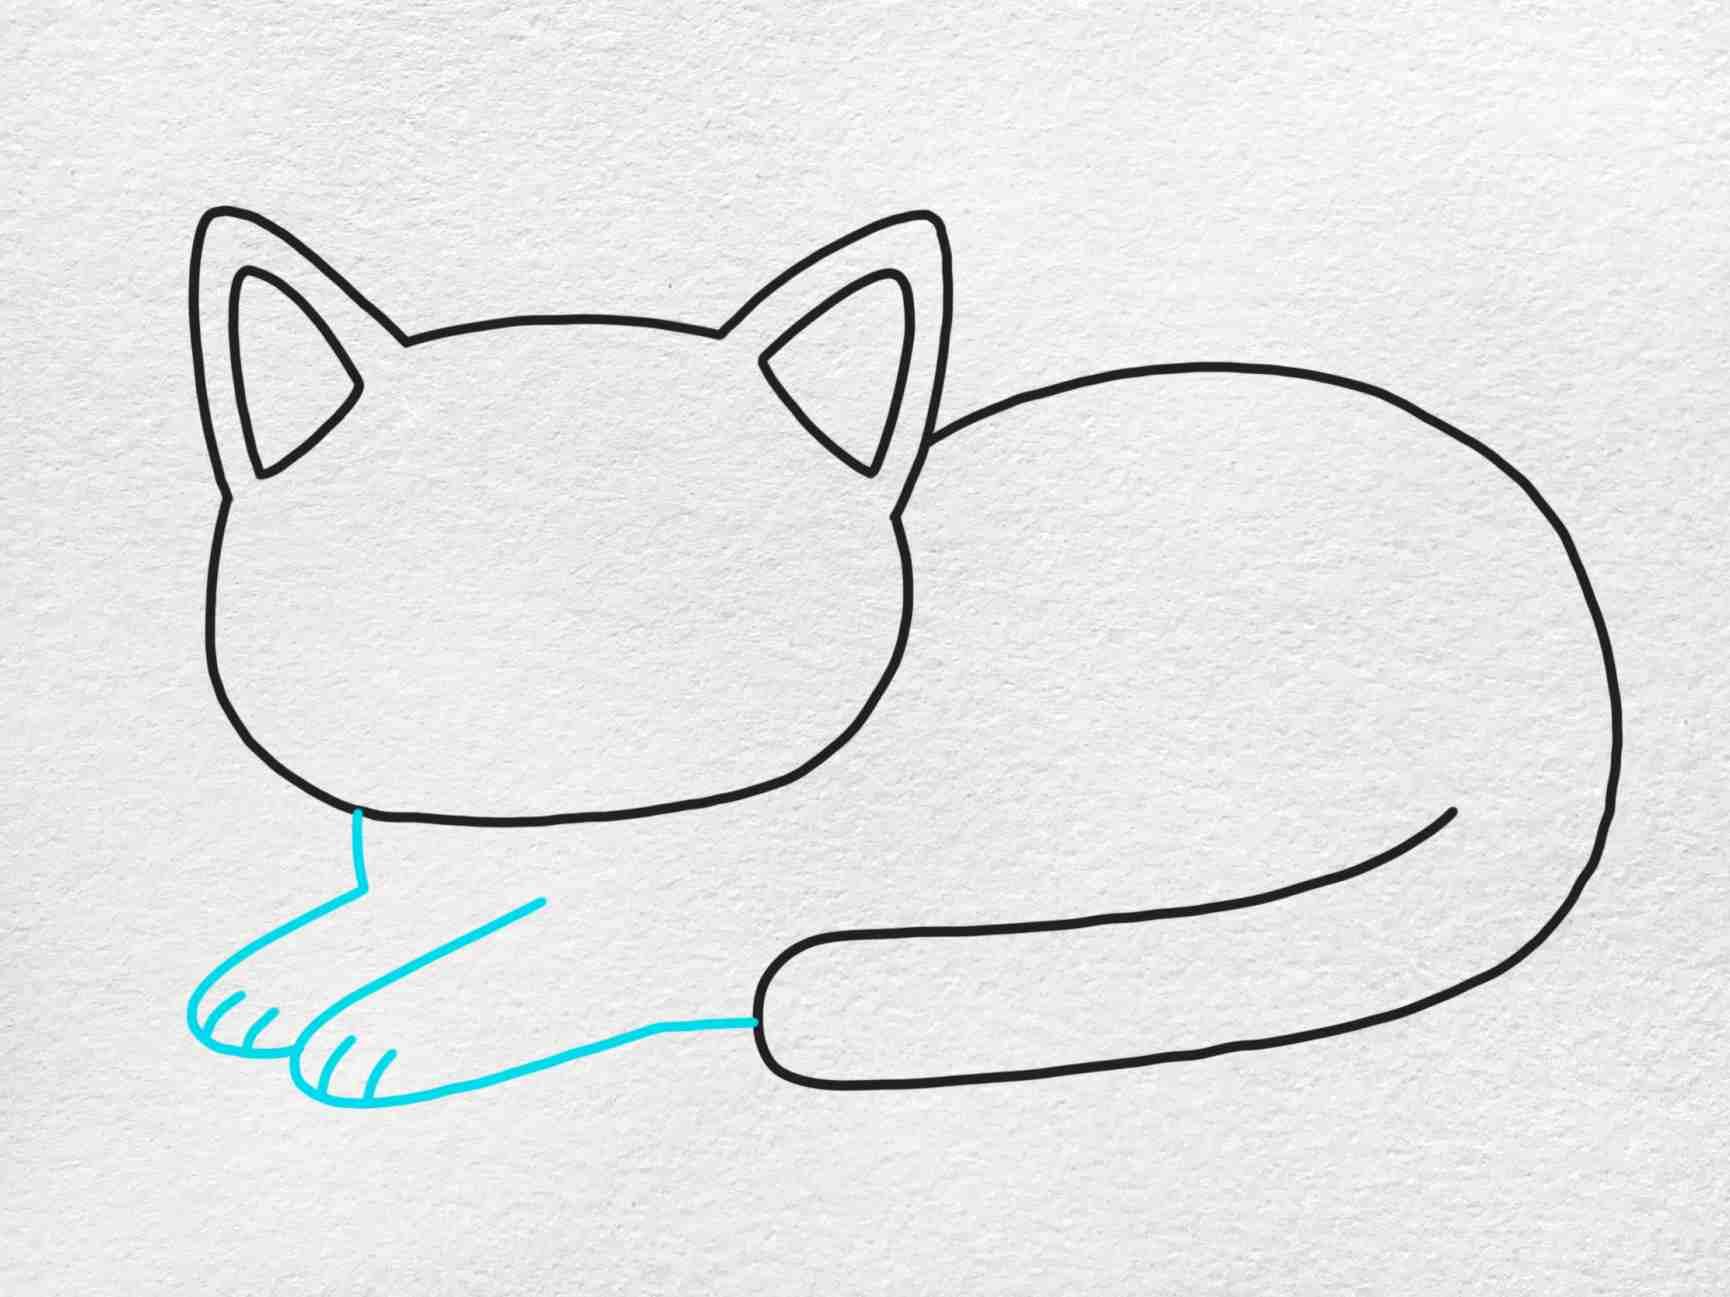 Fat Cat Drawing: Step 4